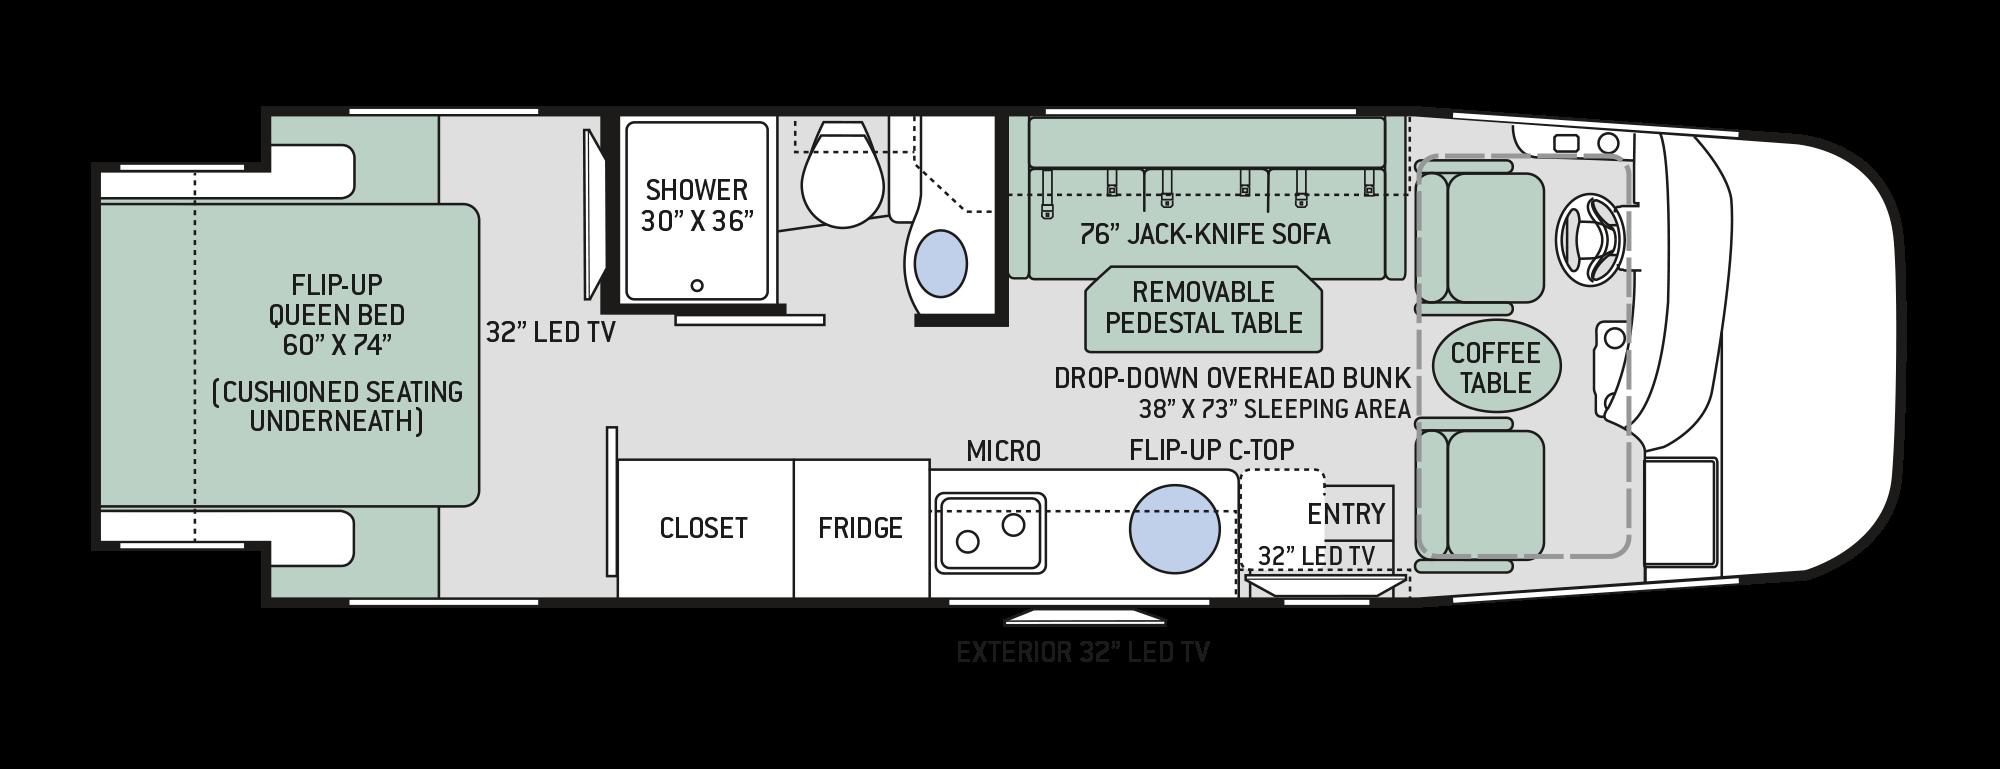 Floor plans axis 25 2 for 2018 thor motor coach axis 25 3